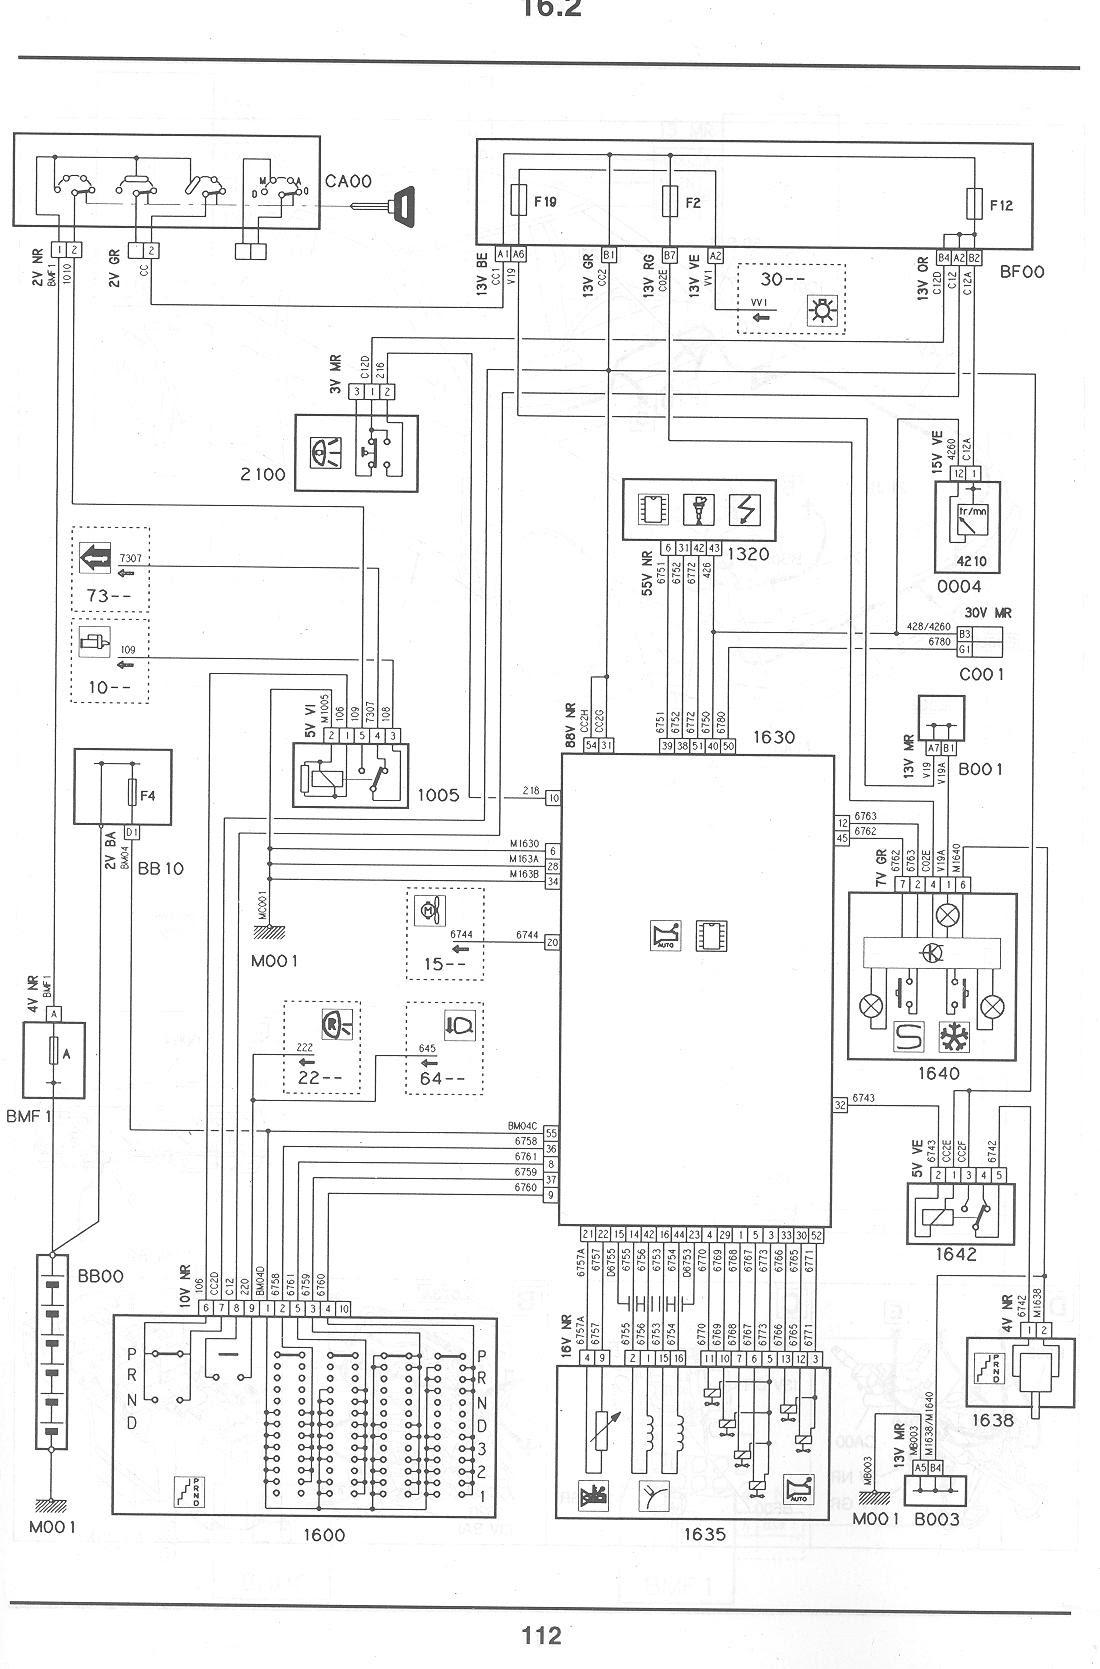 citroen gs wiring diagram image 4